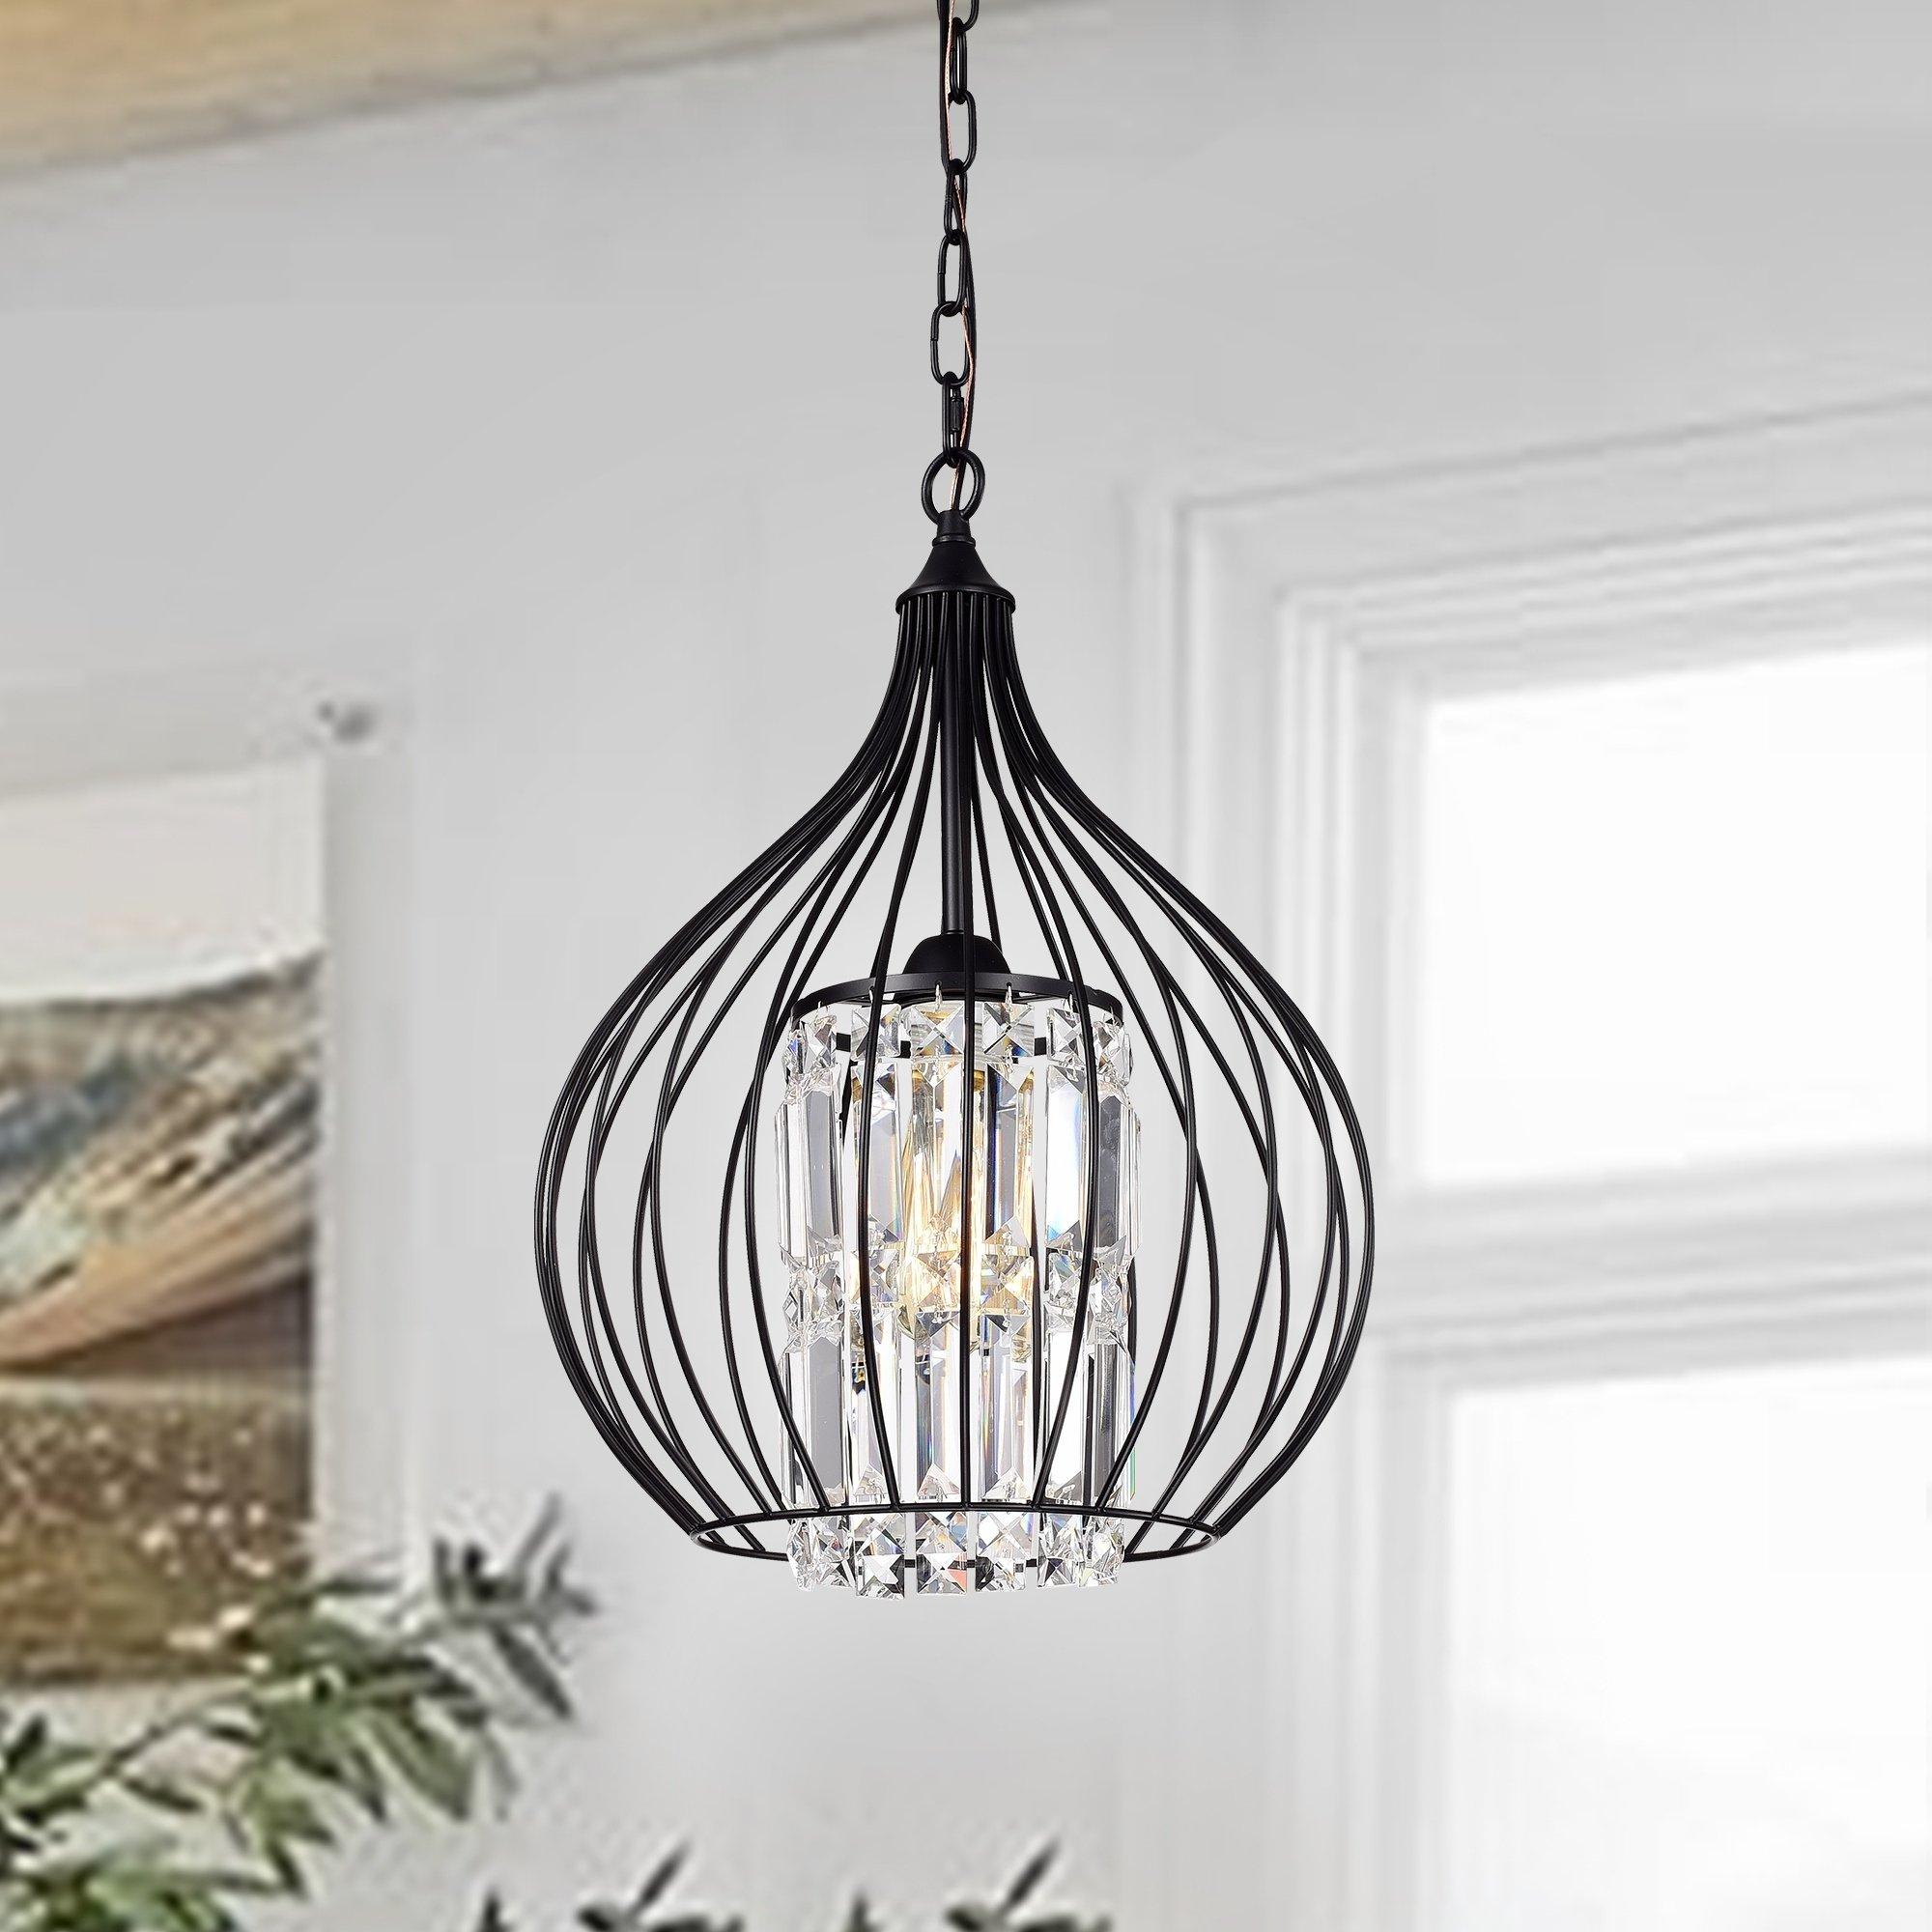 Johanne Matte Black 1 Light Pendant With Crystal Shade In Inside Popular Helina 1 Light Pendants (View 19 of 20)